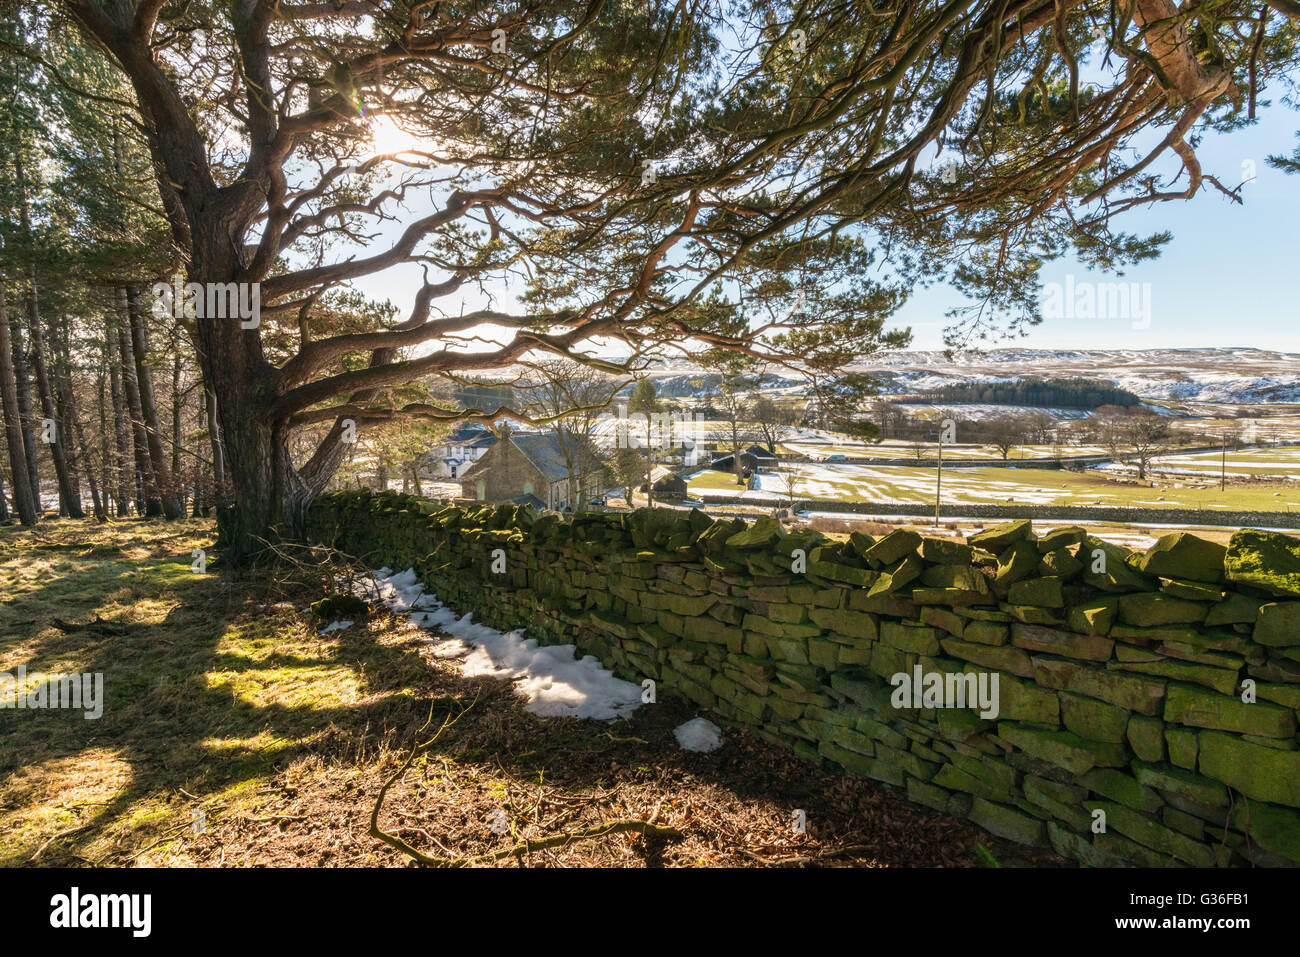 The landscape at Bowlees picnic area, Barnard Castle, Durham - Stock Image